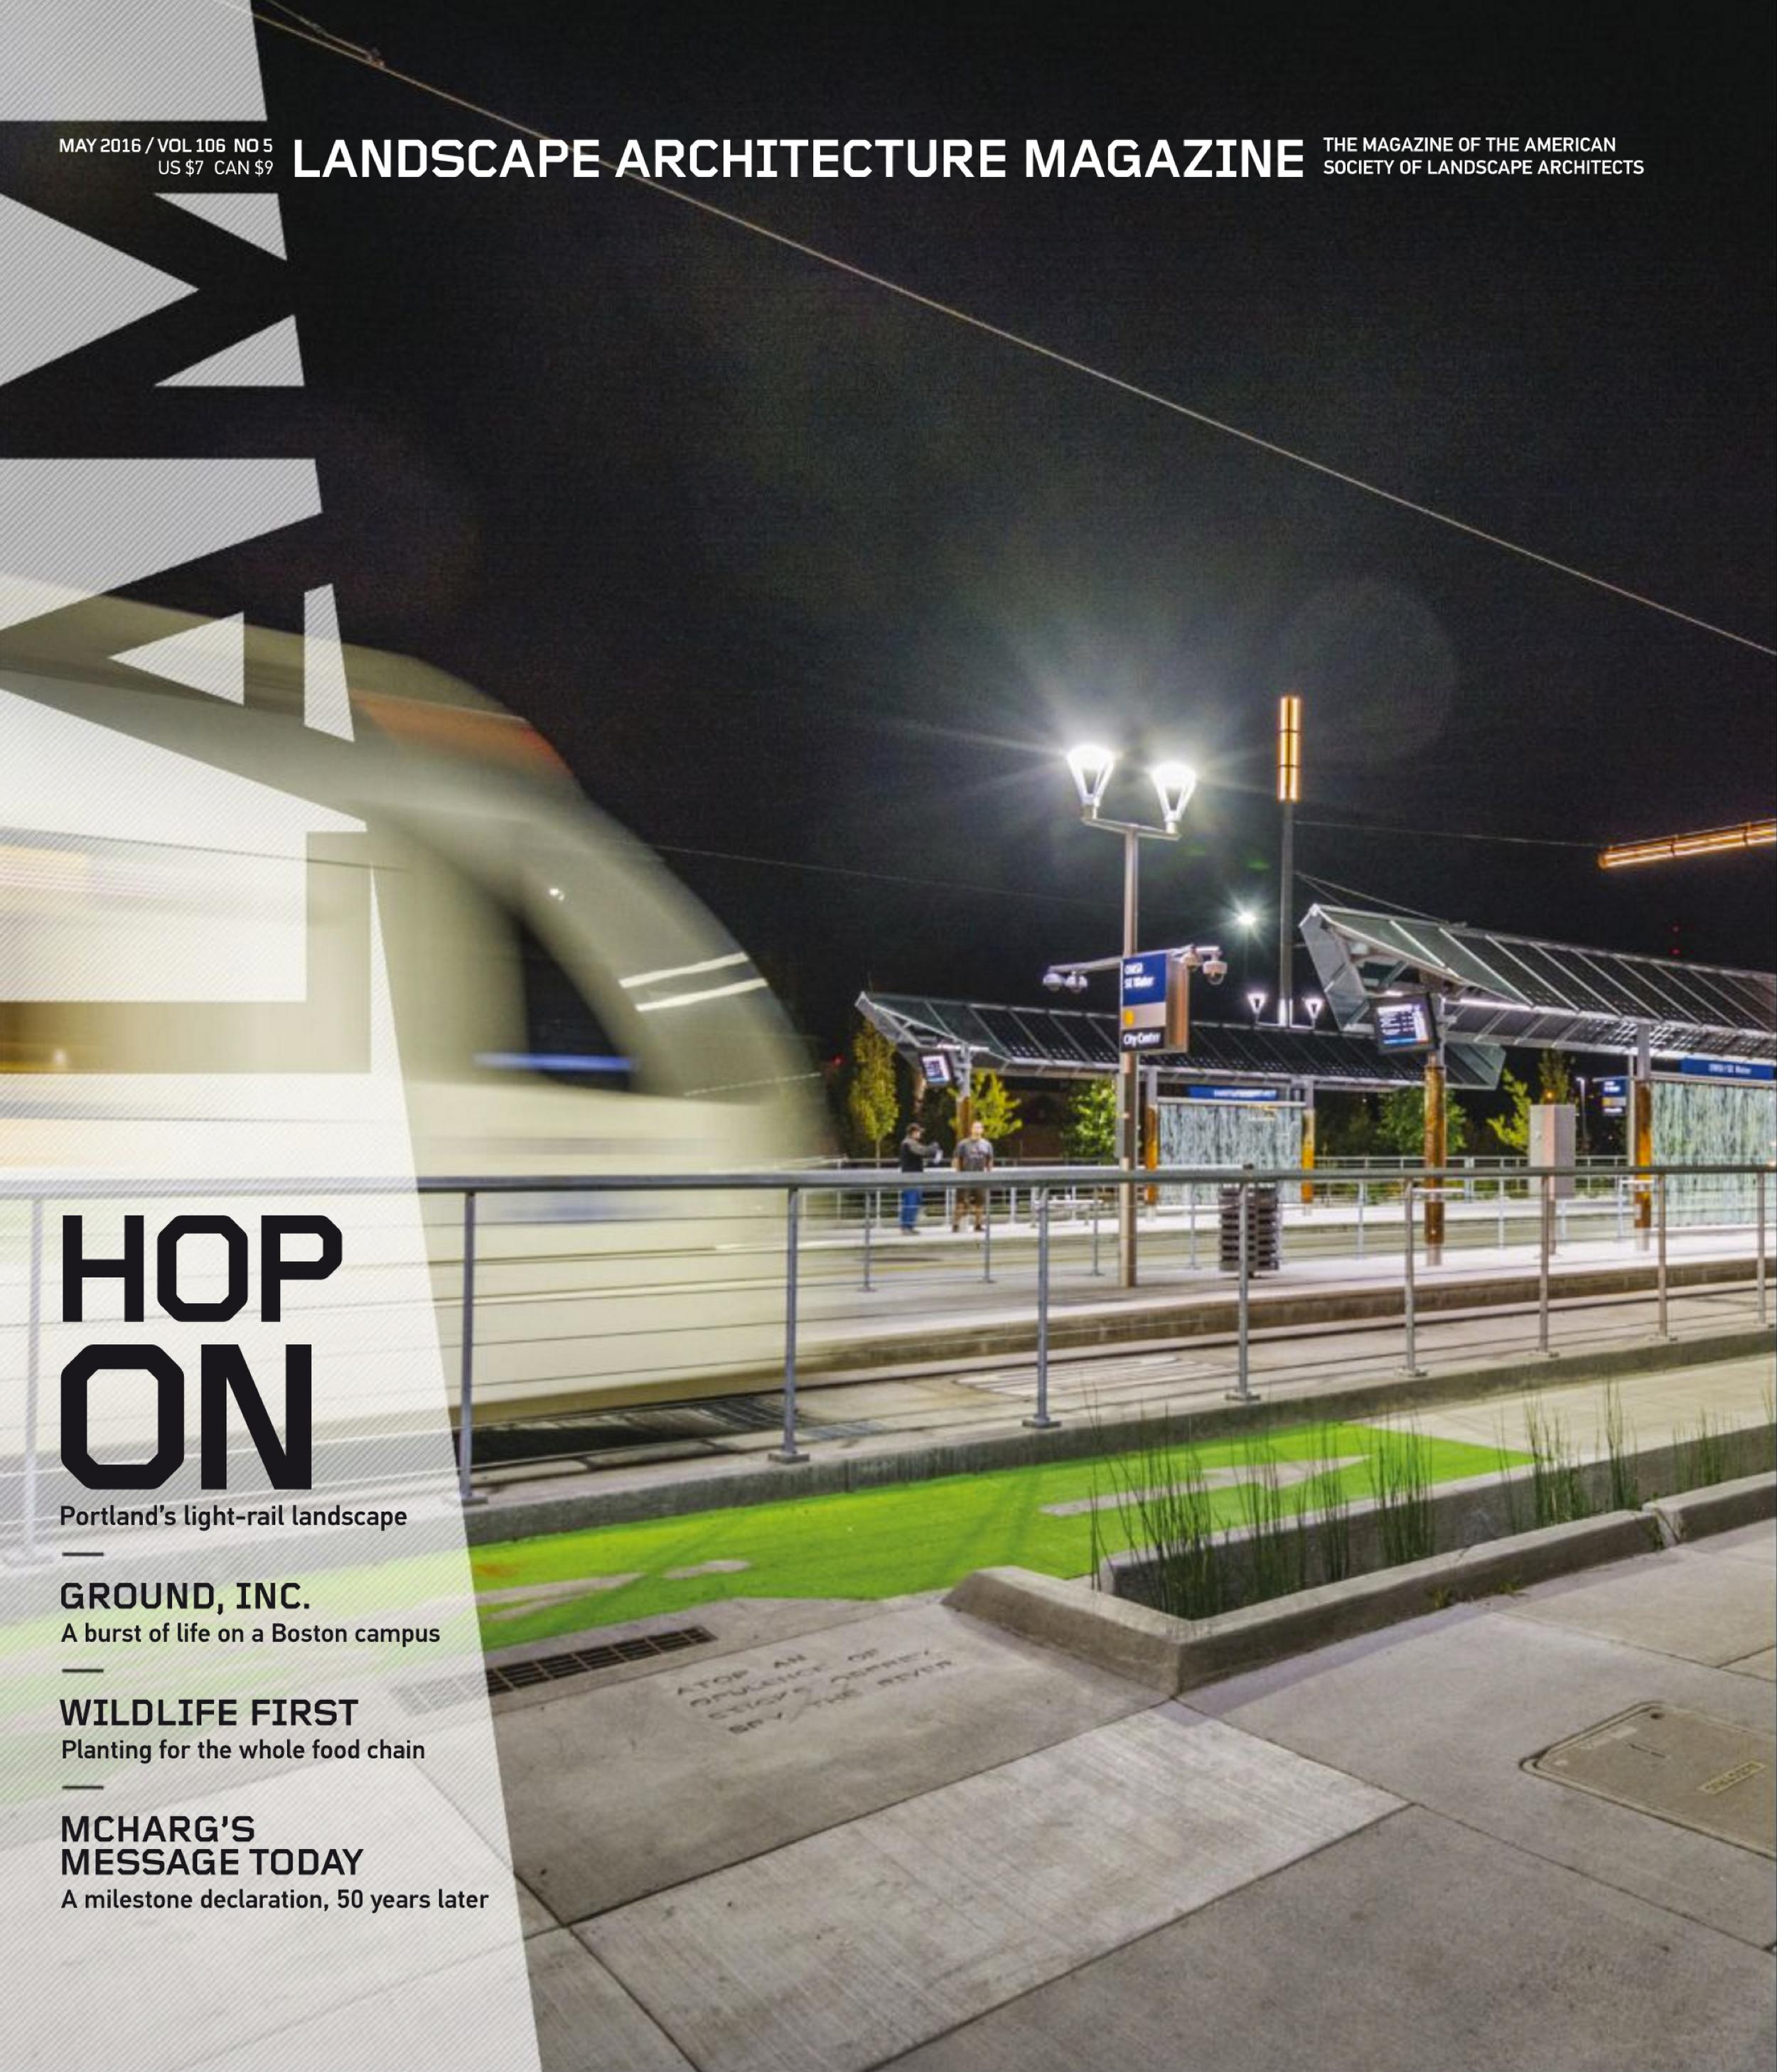 ArchitecturalMagazineSpread_Trimet.jpg